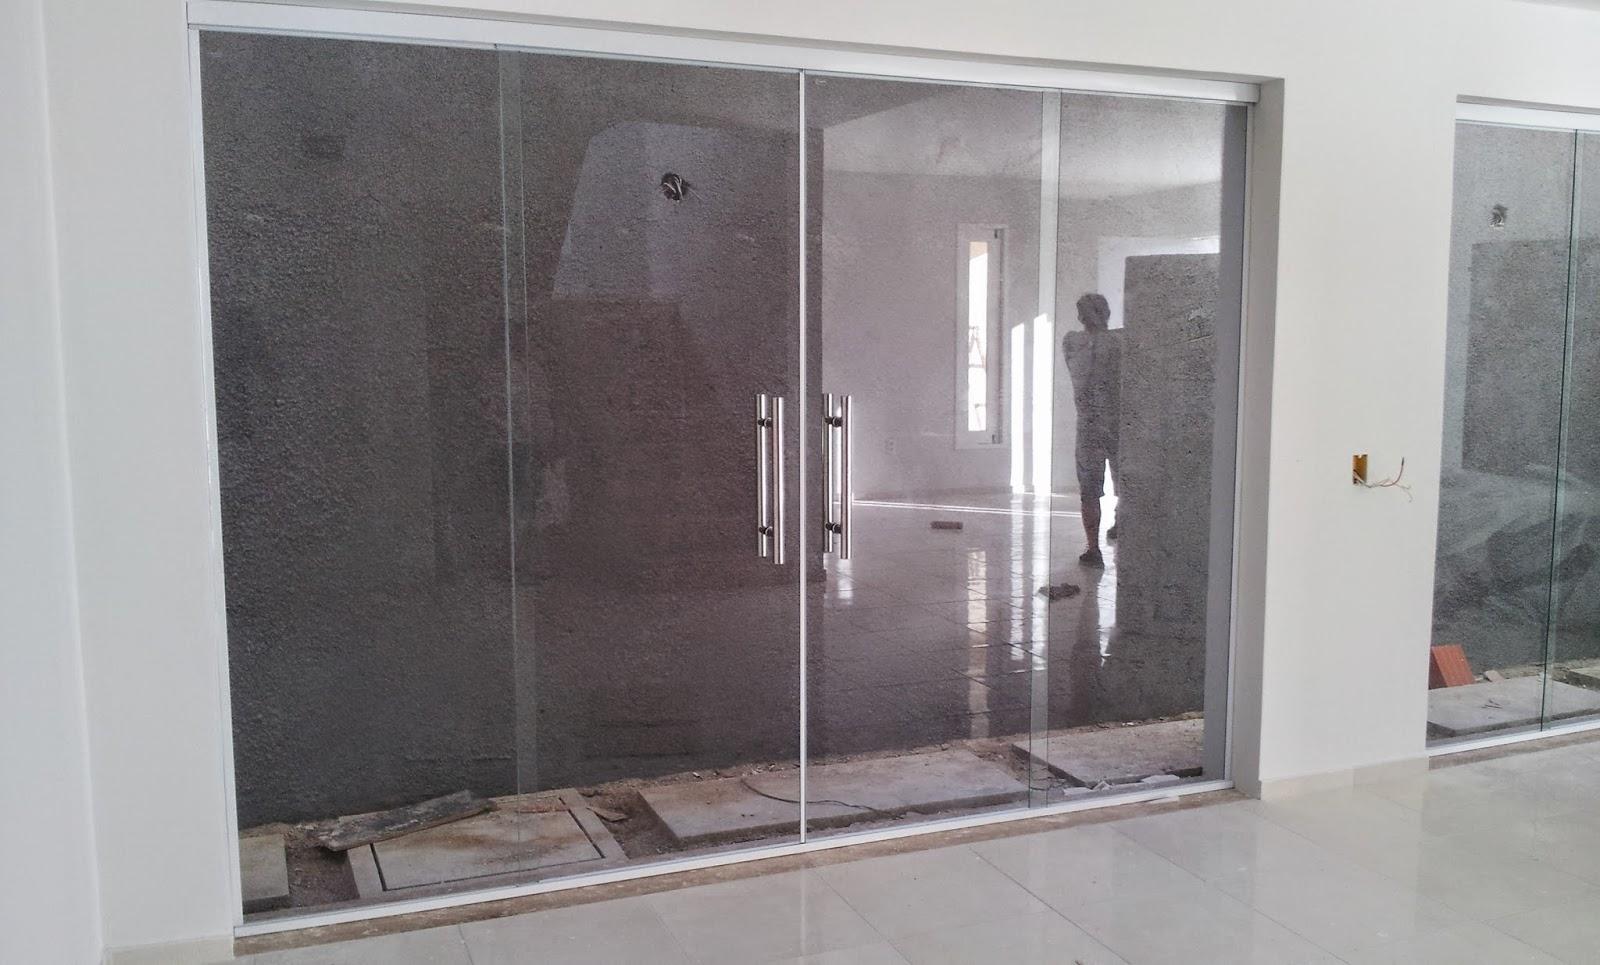 #594C4F  VIDRAÇARIA : JANELA E PORTA M 2000 DE VIDRO TEMPERADO EM FORTALEZA 414 Janelas De Vidros Em Fortaleza